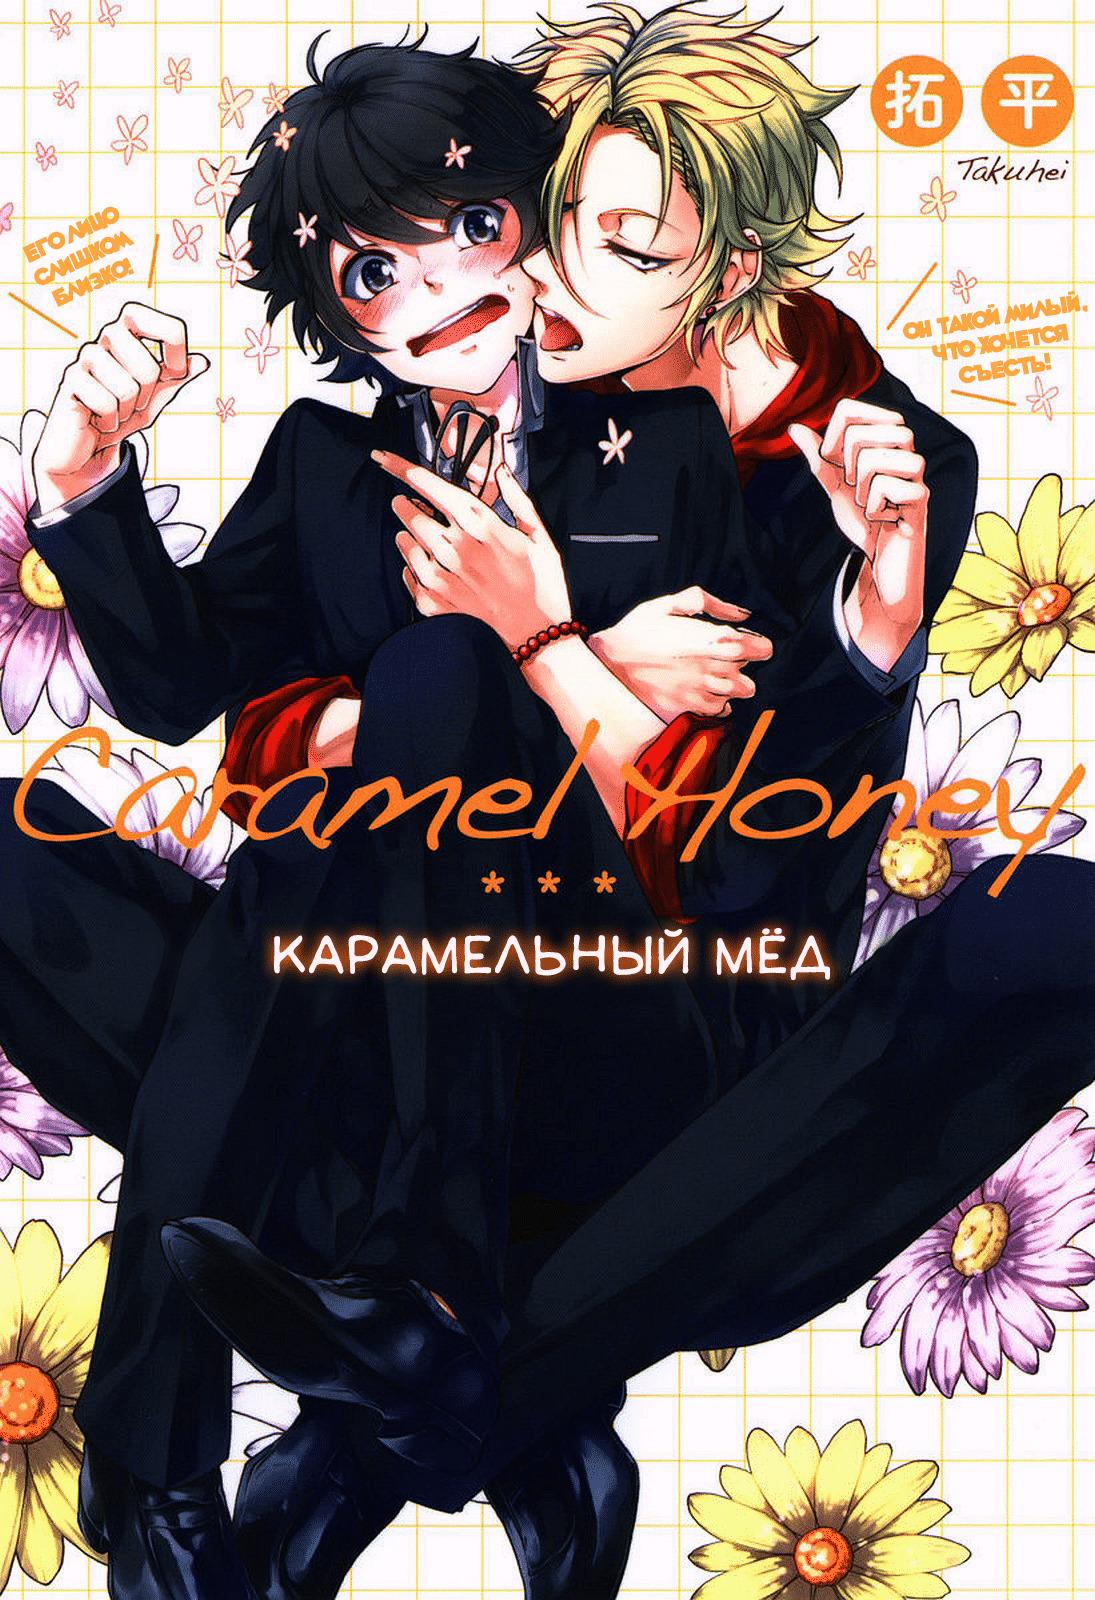 Манга Карамельный мёд / Caramel Honey - Глава 1 Страница 1